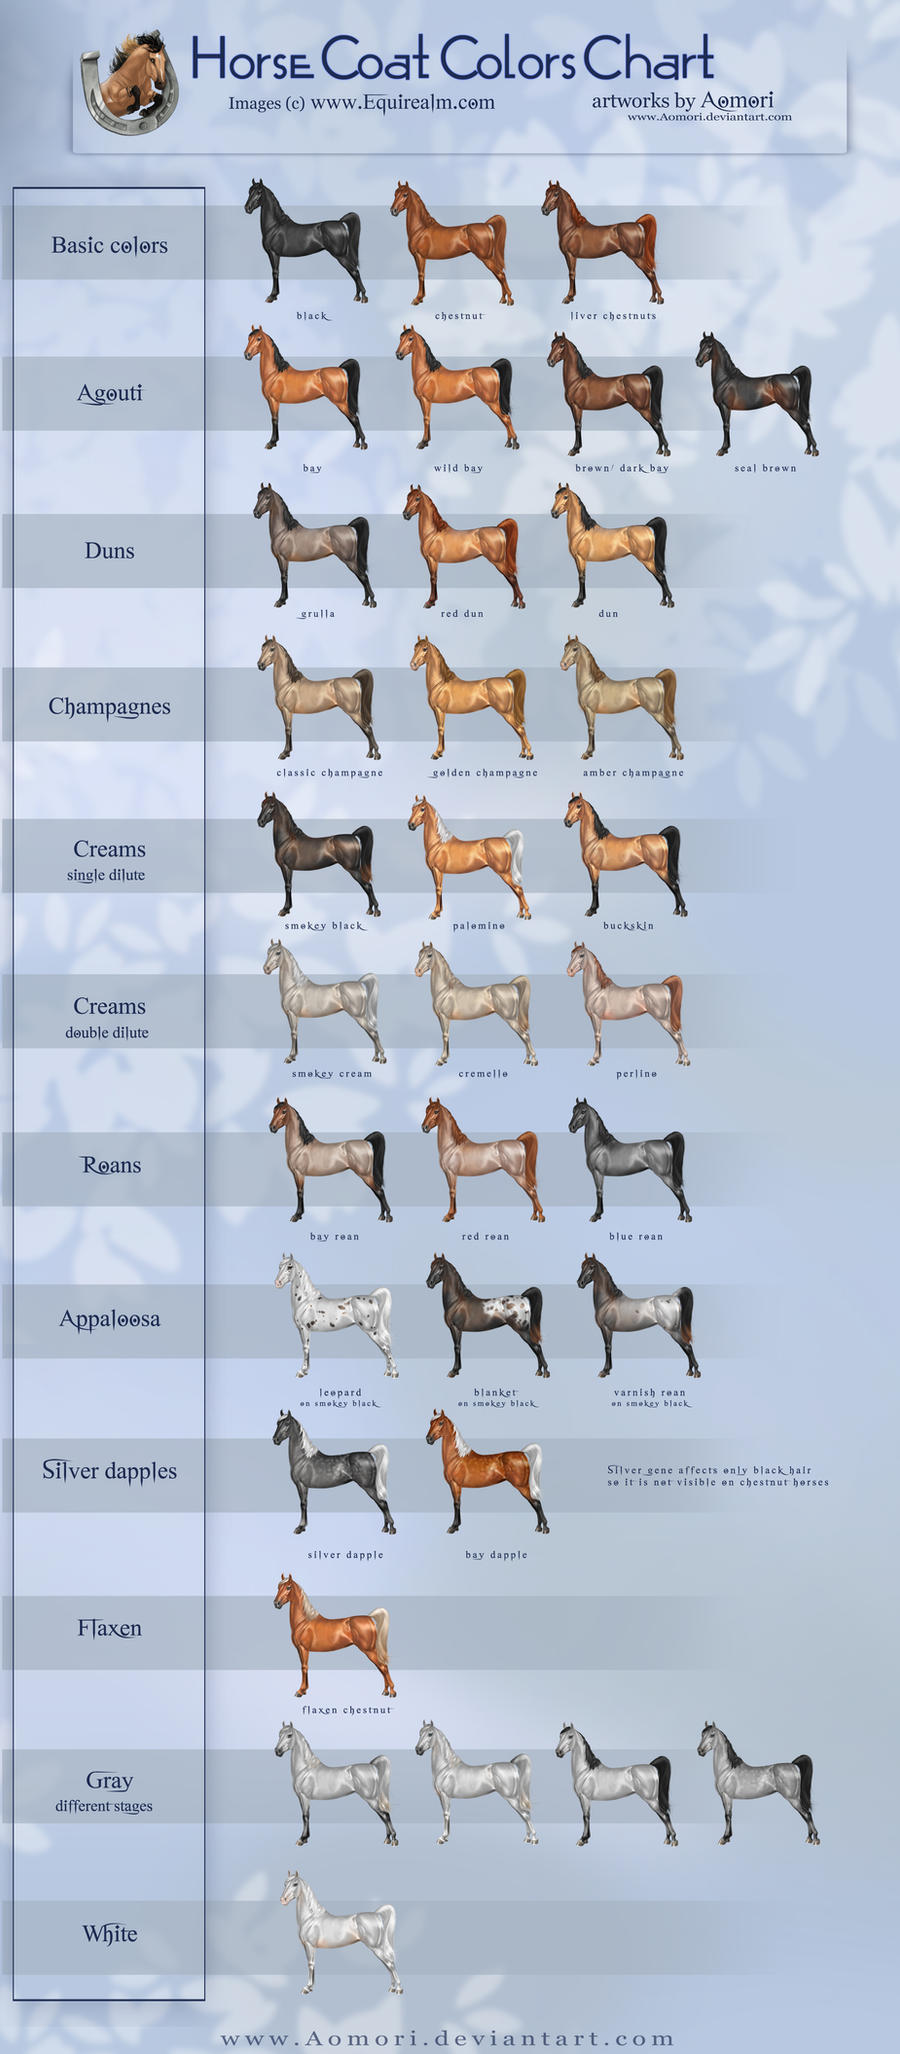 Horse coat colors chart by Aomori